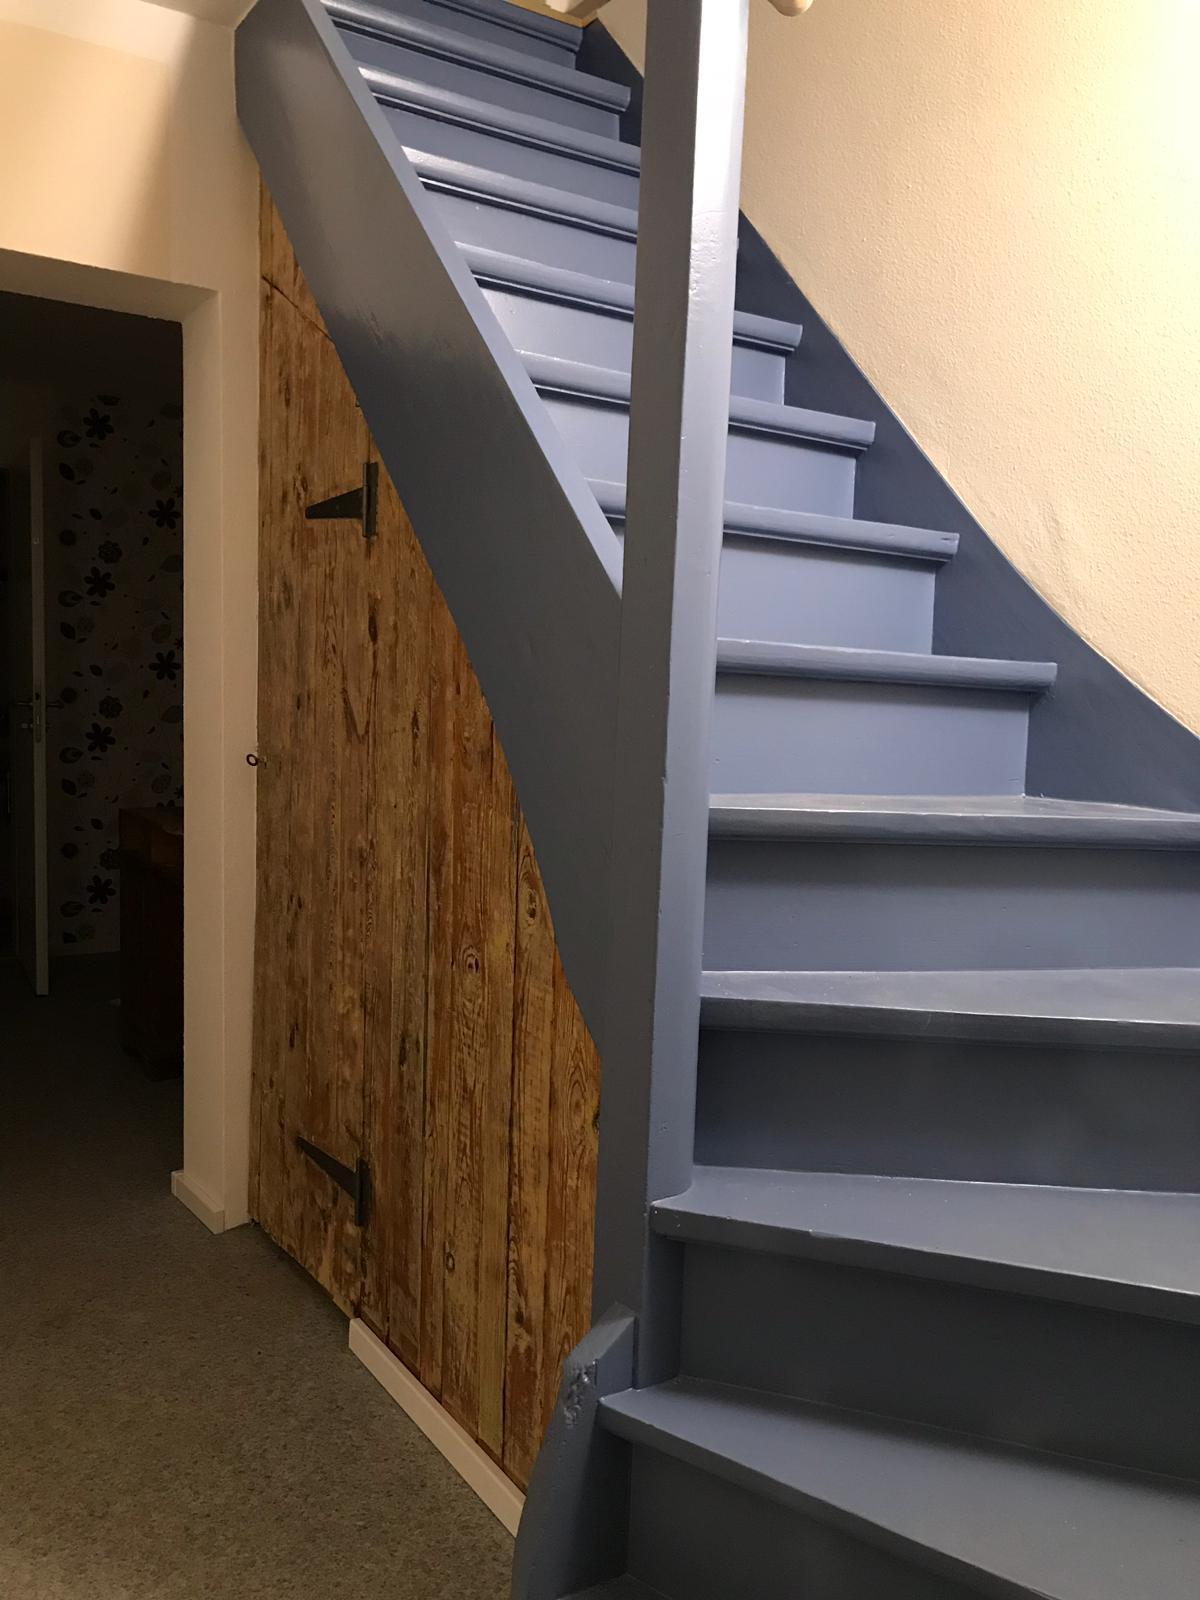 Treppe zur 2. Etage